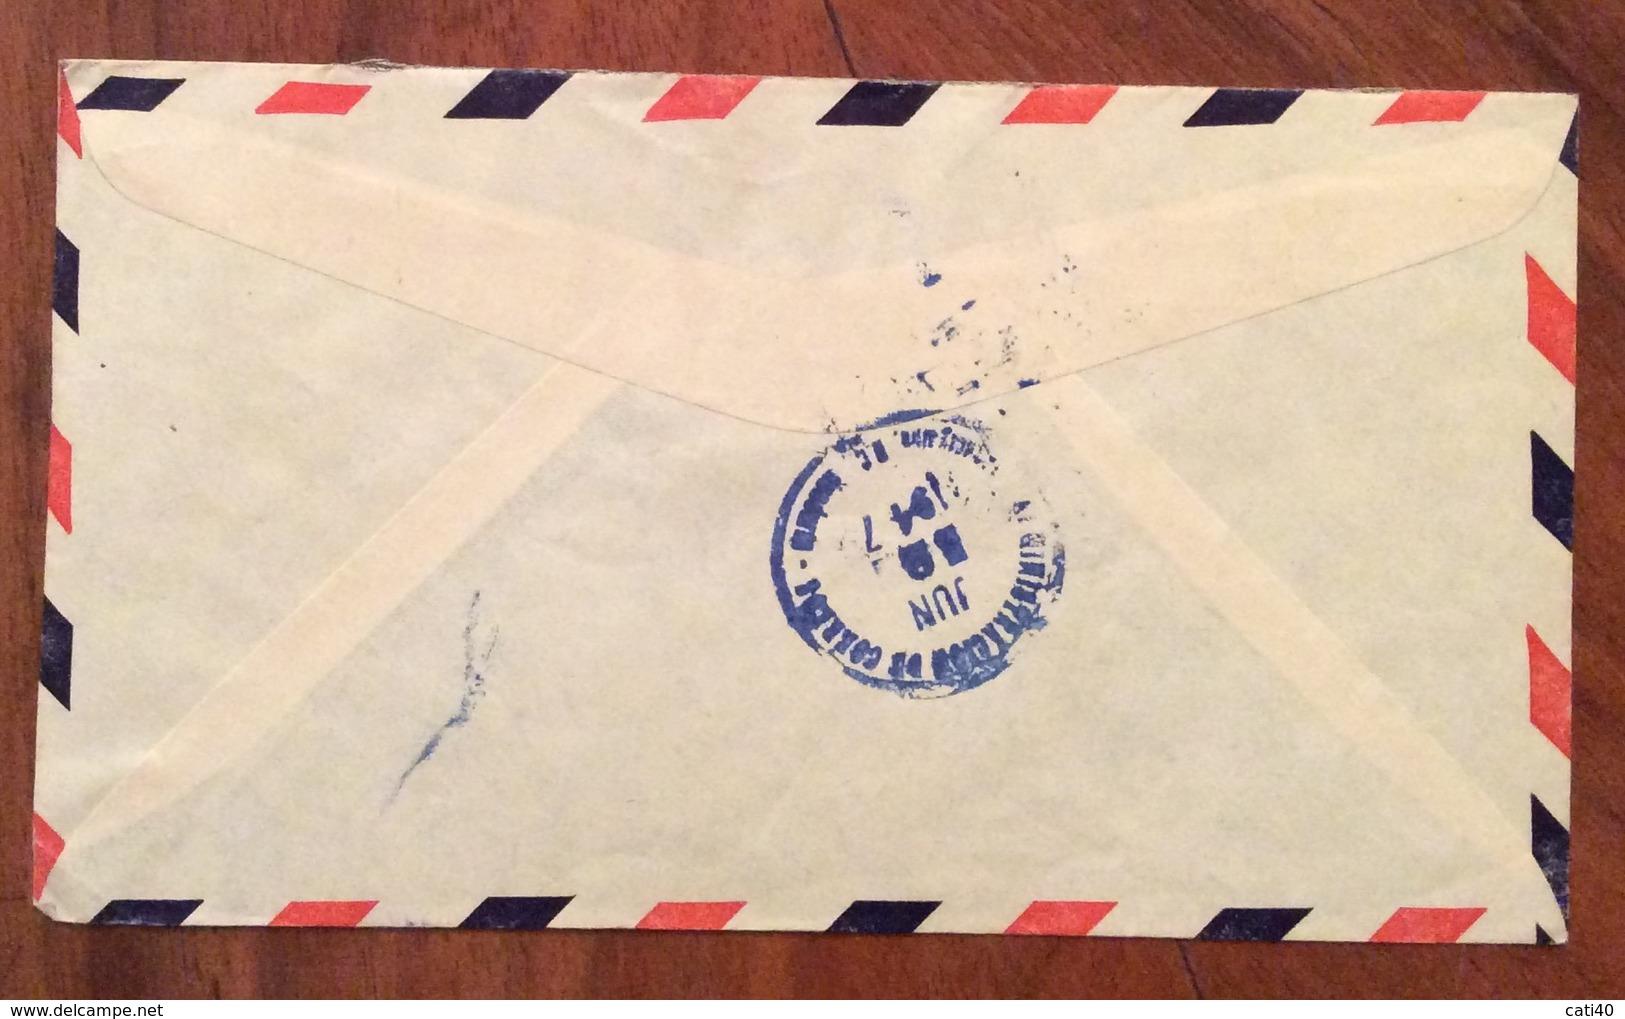 POSTA AEREA PAR AVION  HONDURAS  U.S.A.  FROM  SAN PEDRO SULA    TO  MINNEAPOLIS  THE 31/5/47 - Honduras